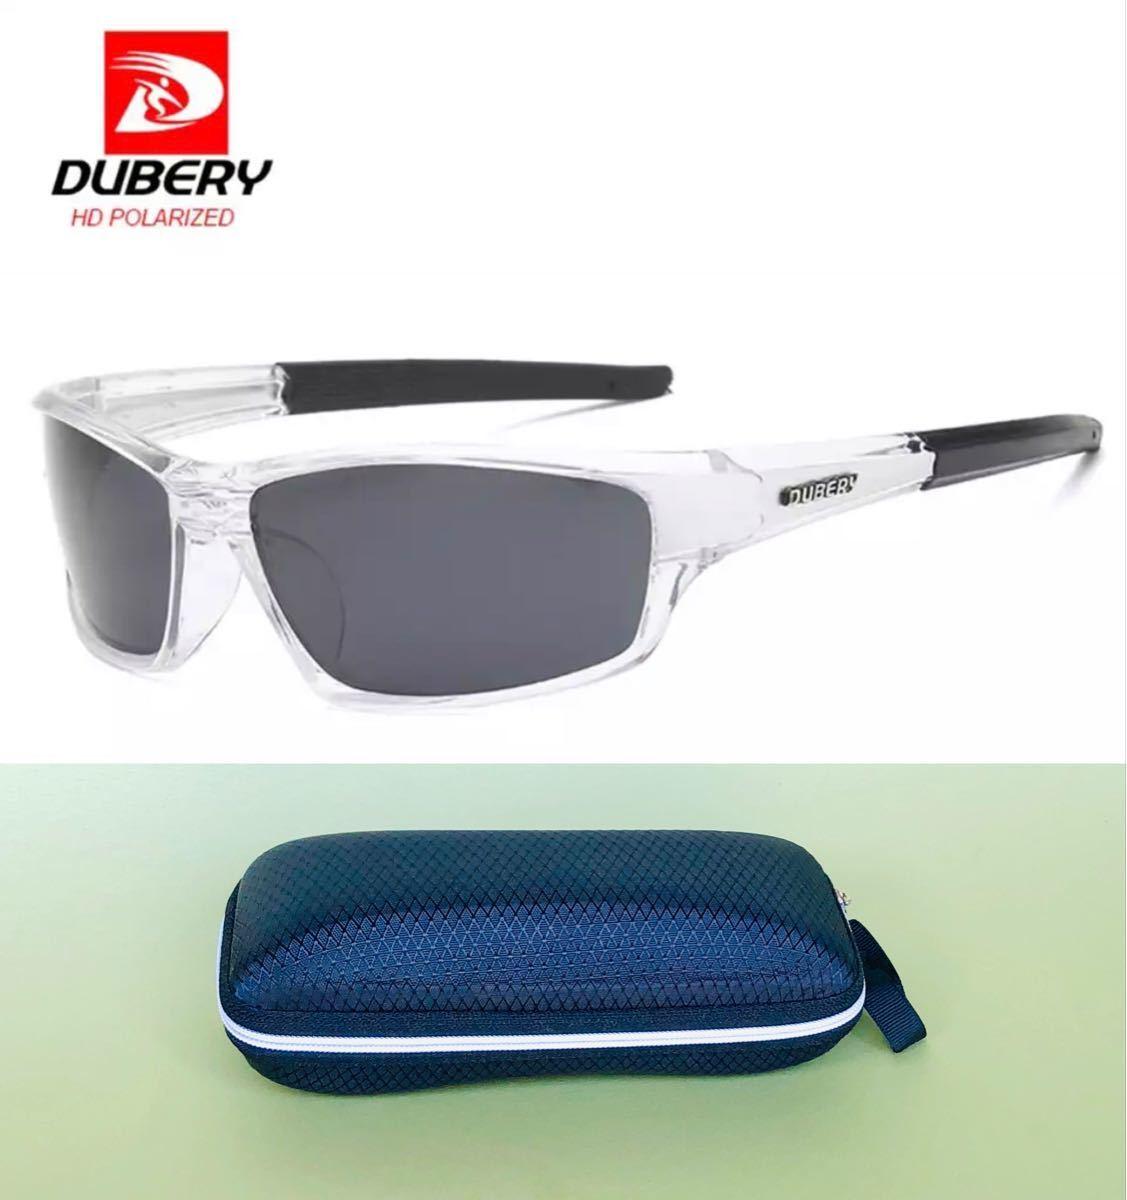 DUBERY サングラス 偏光グラス UV400 軽量 車  釣り アウトドア スポーツサングラス 偏光レンズ 偏光サングラス